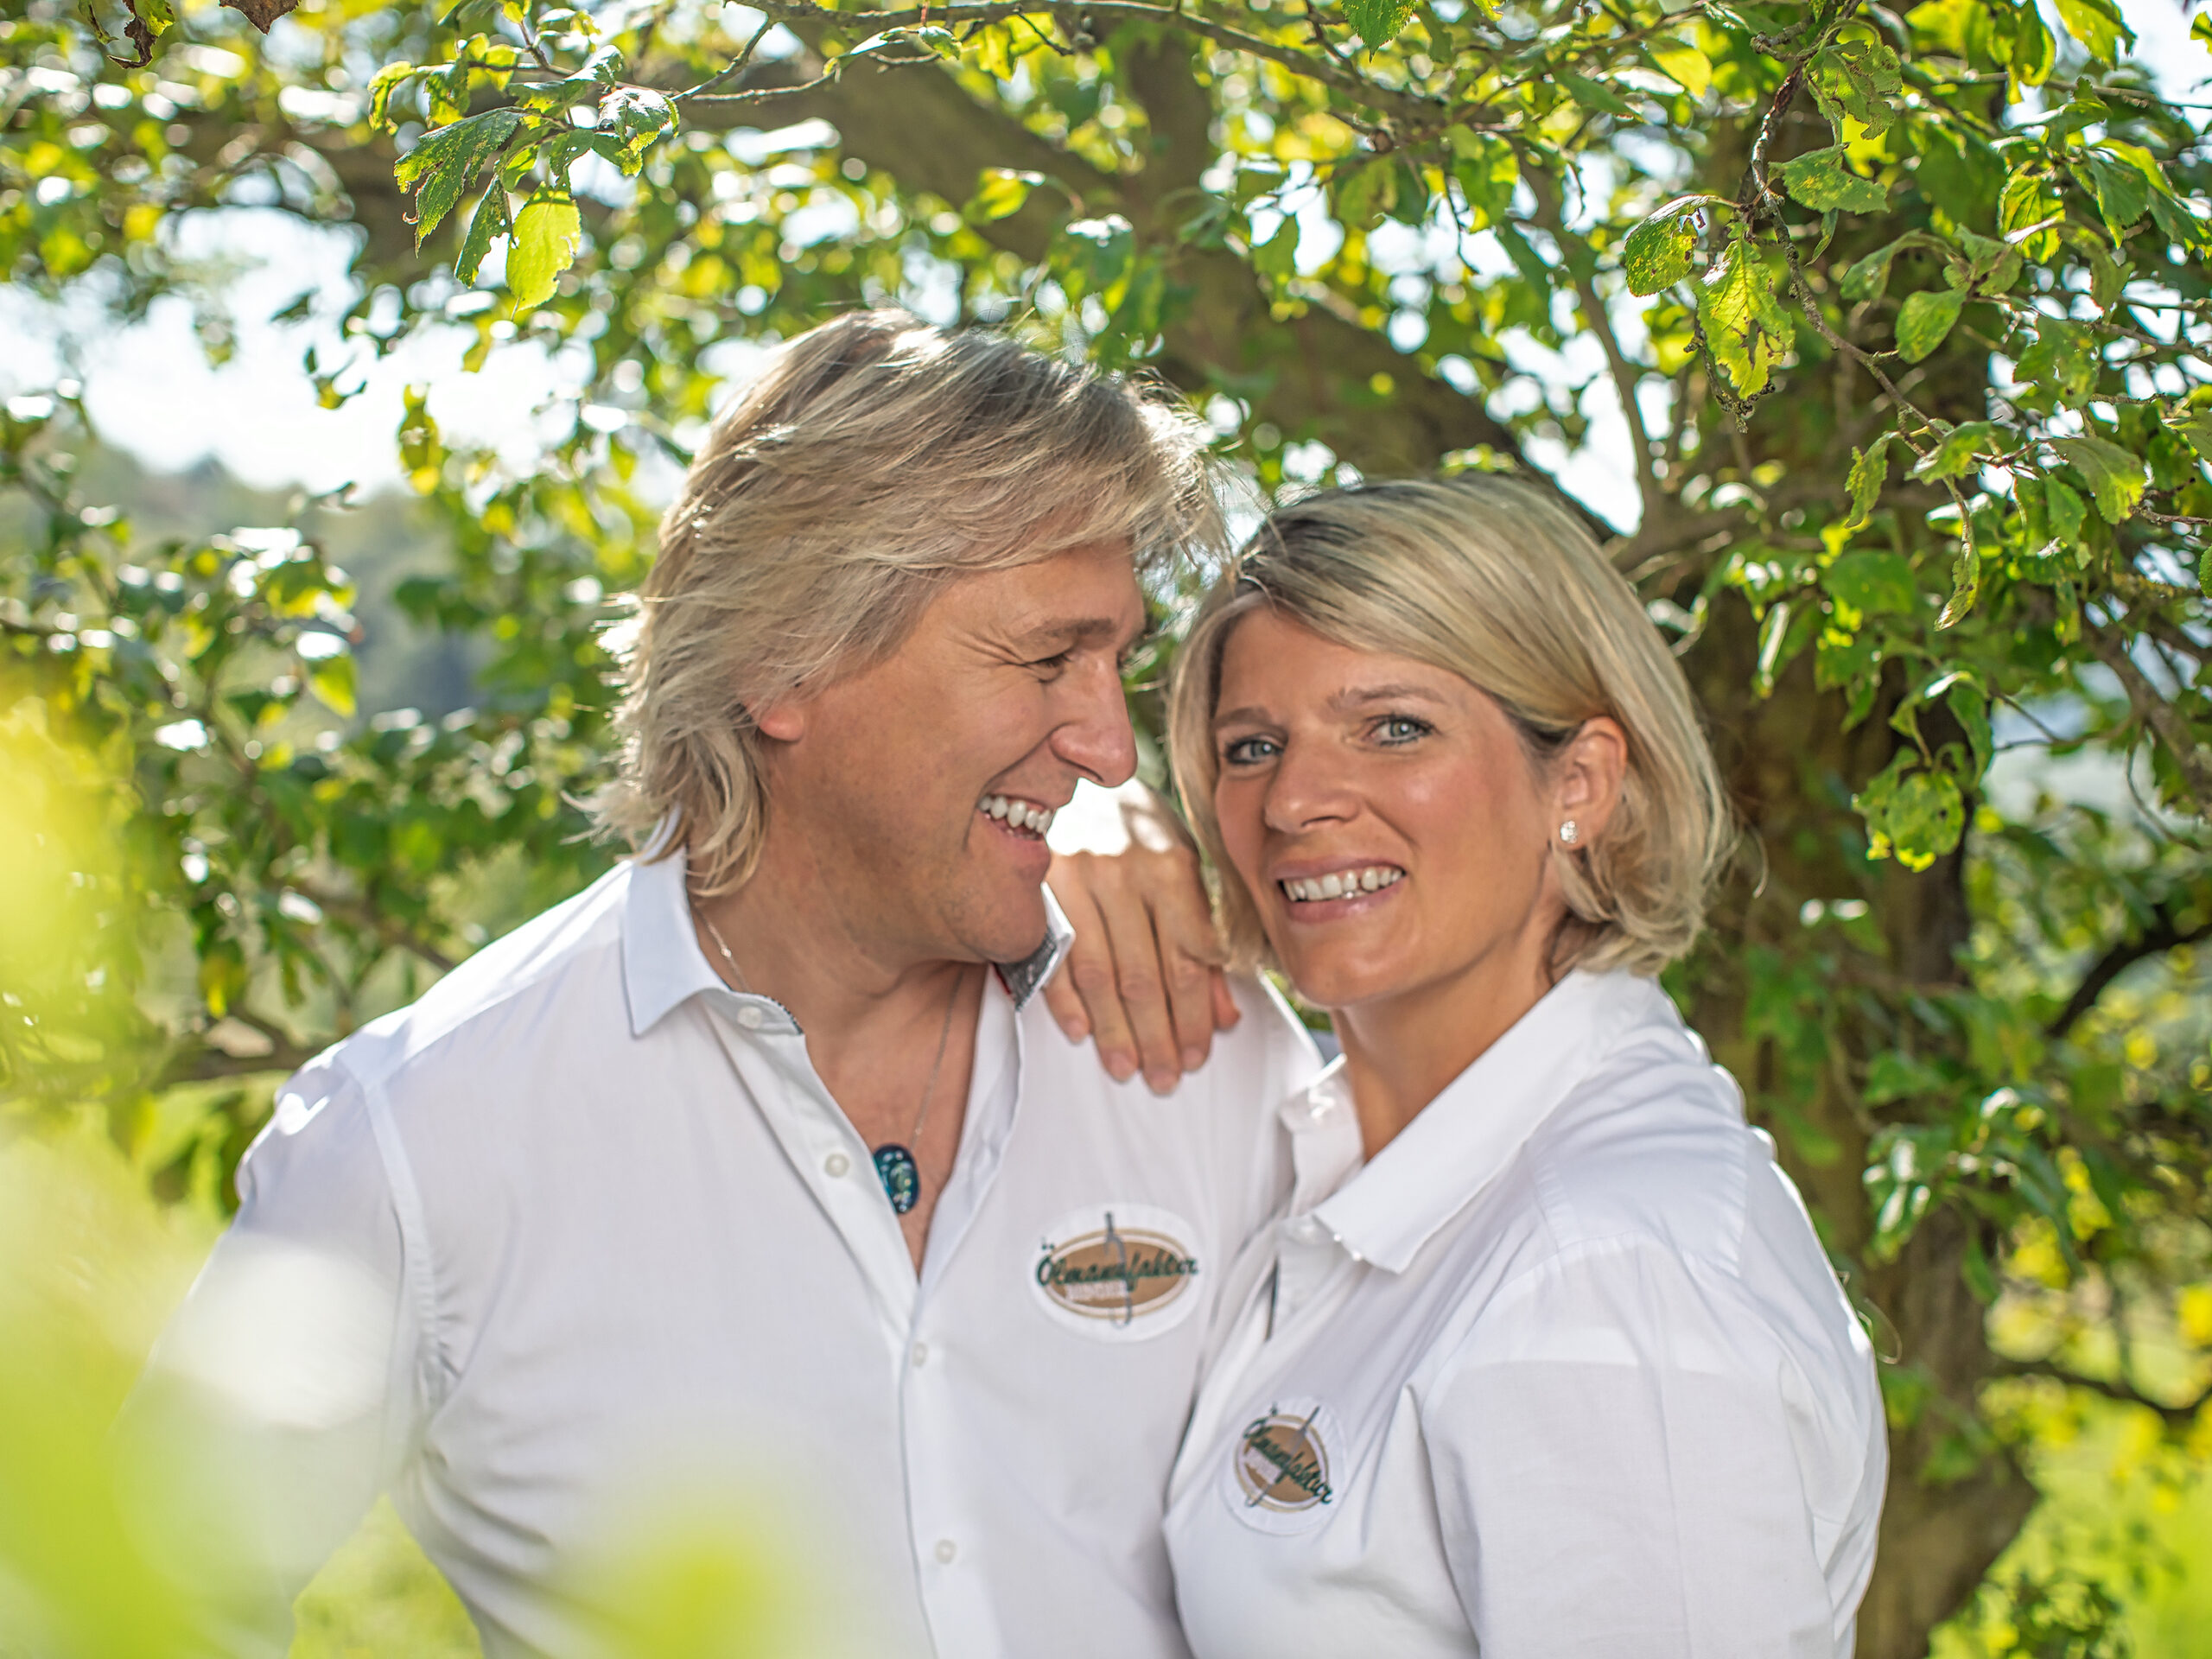 Tanja und Uwe Bender